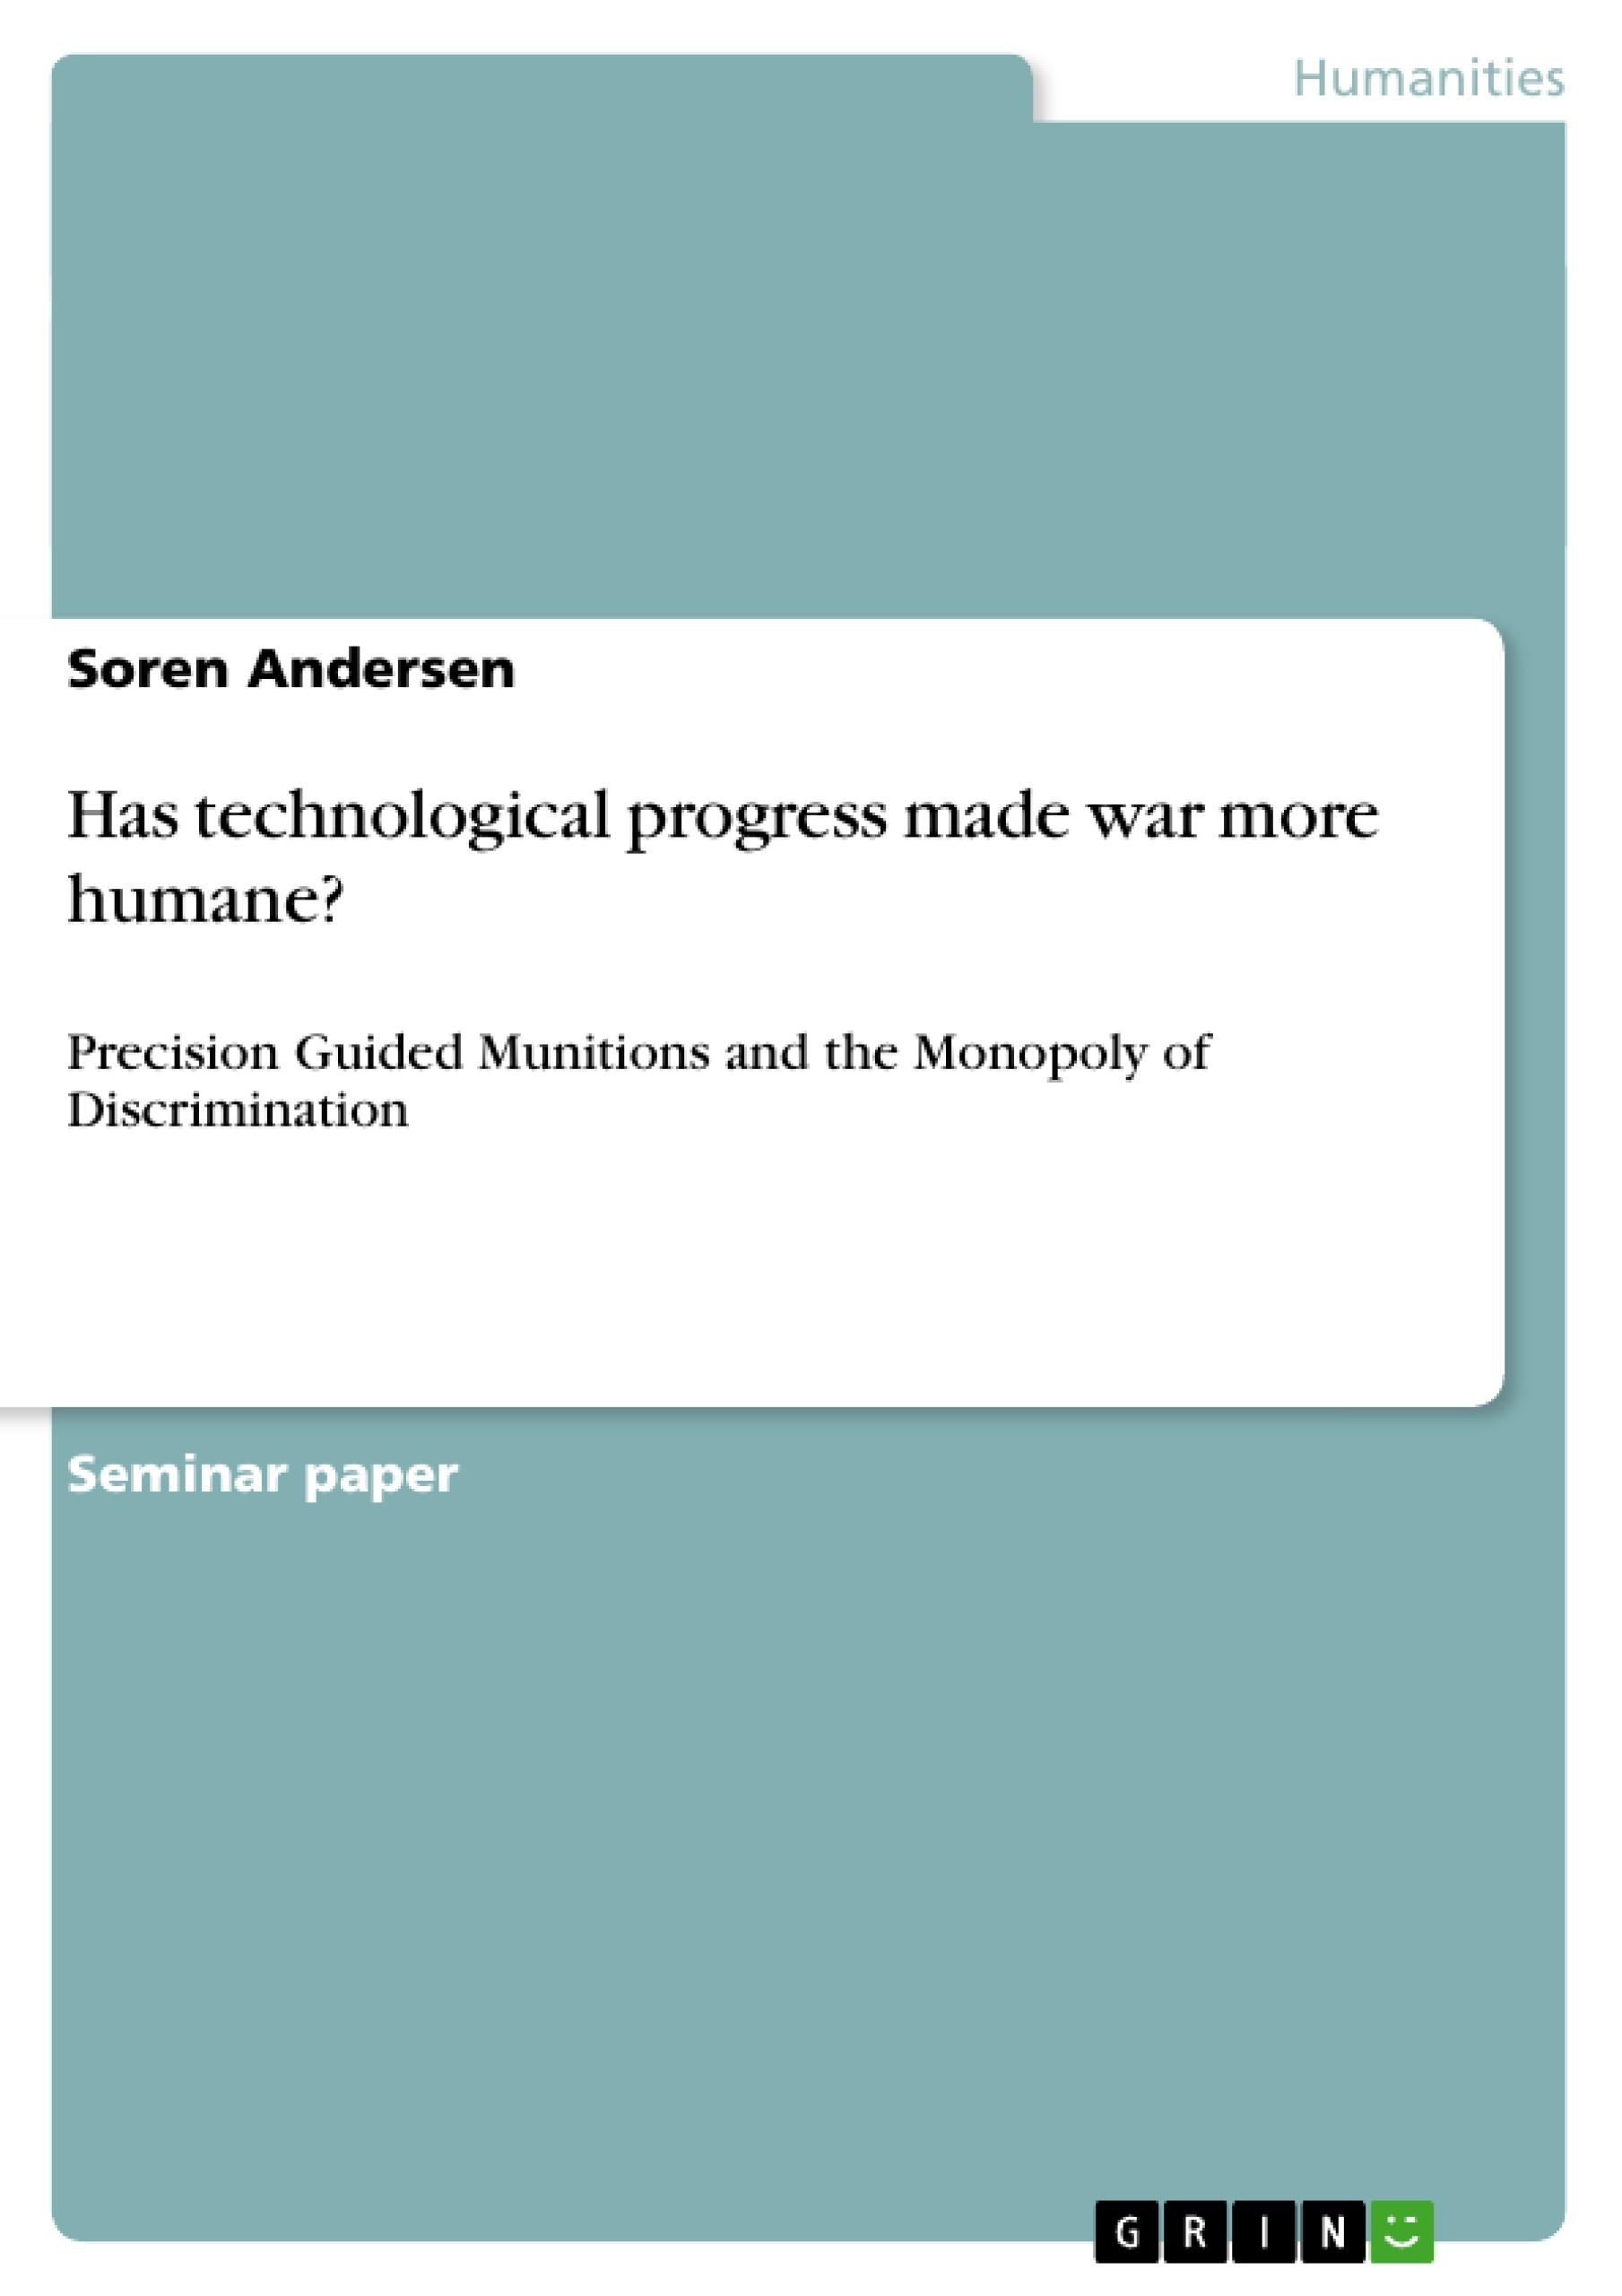 Title: Has technological progress made war more humane?